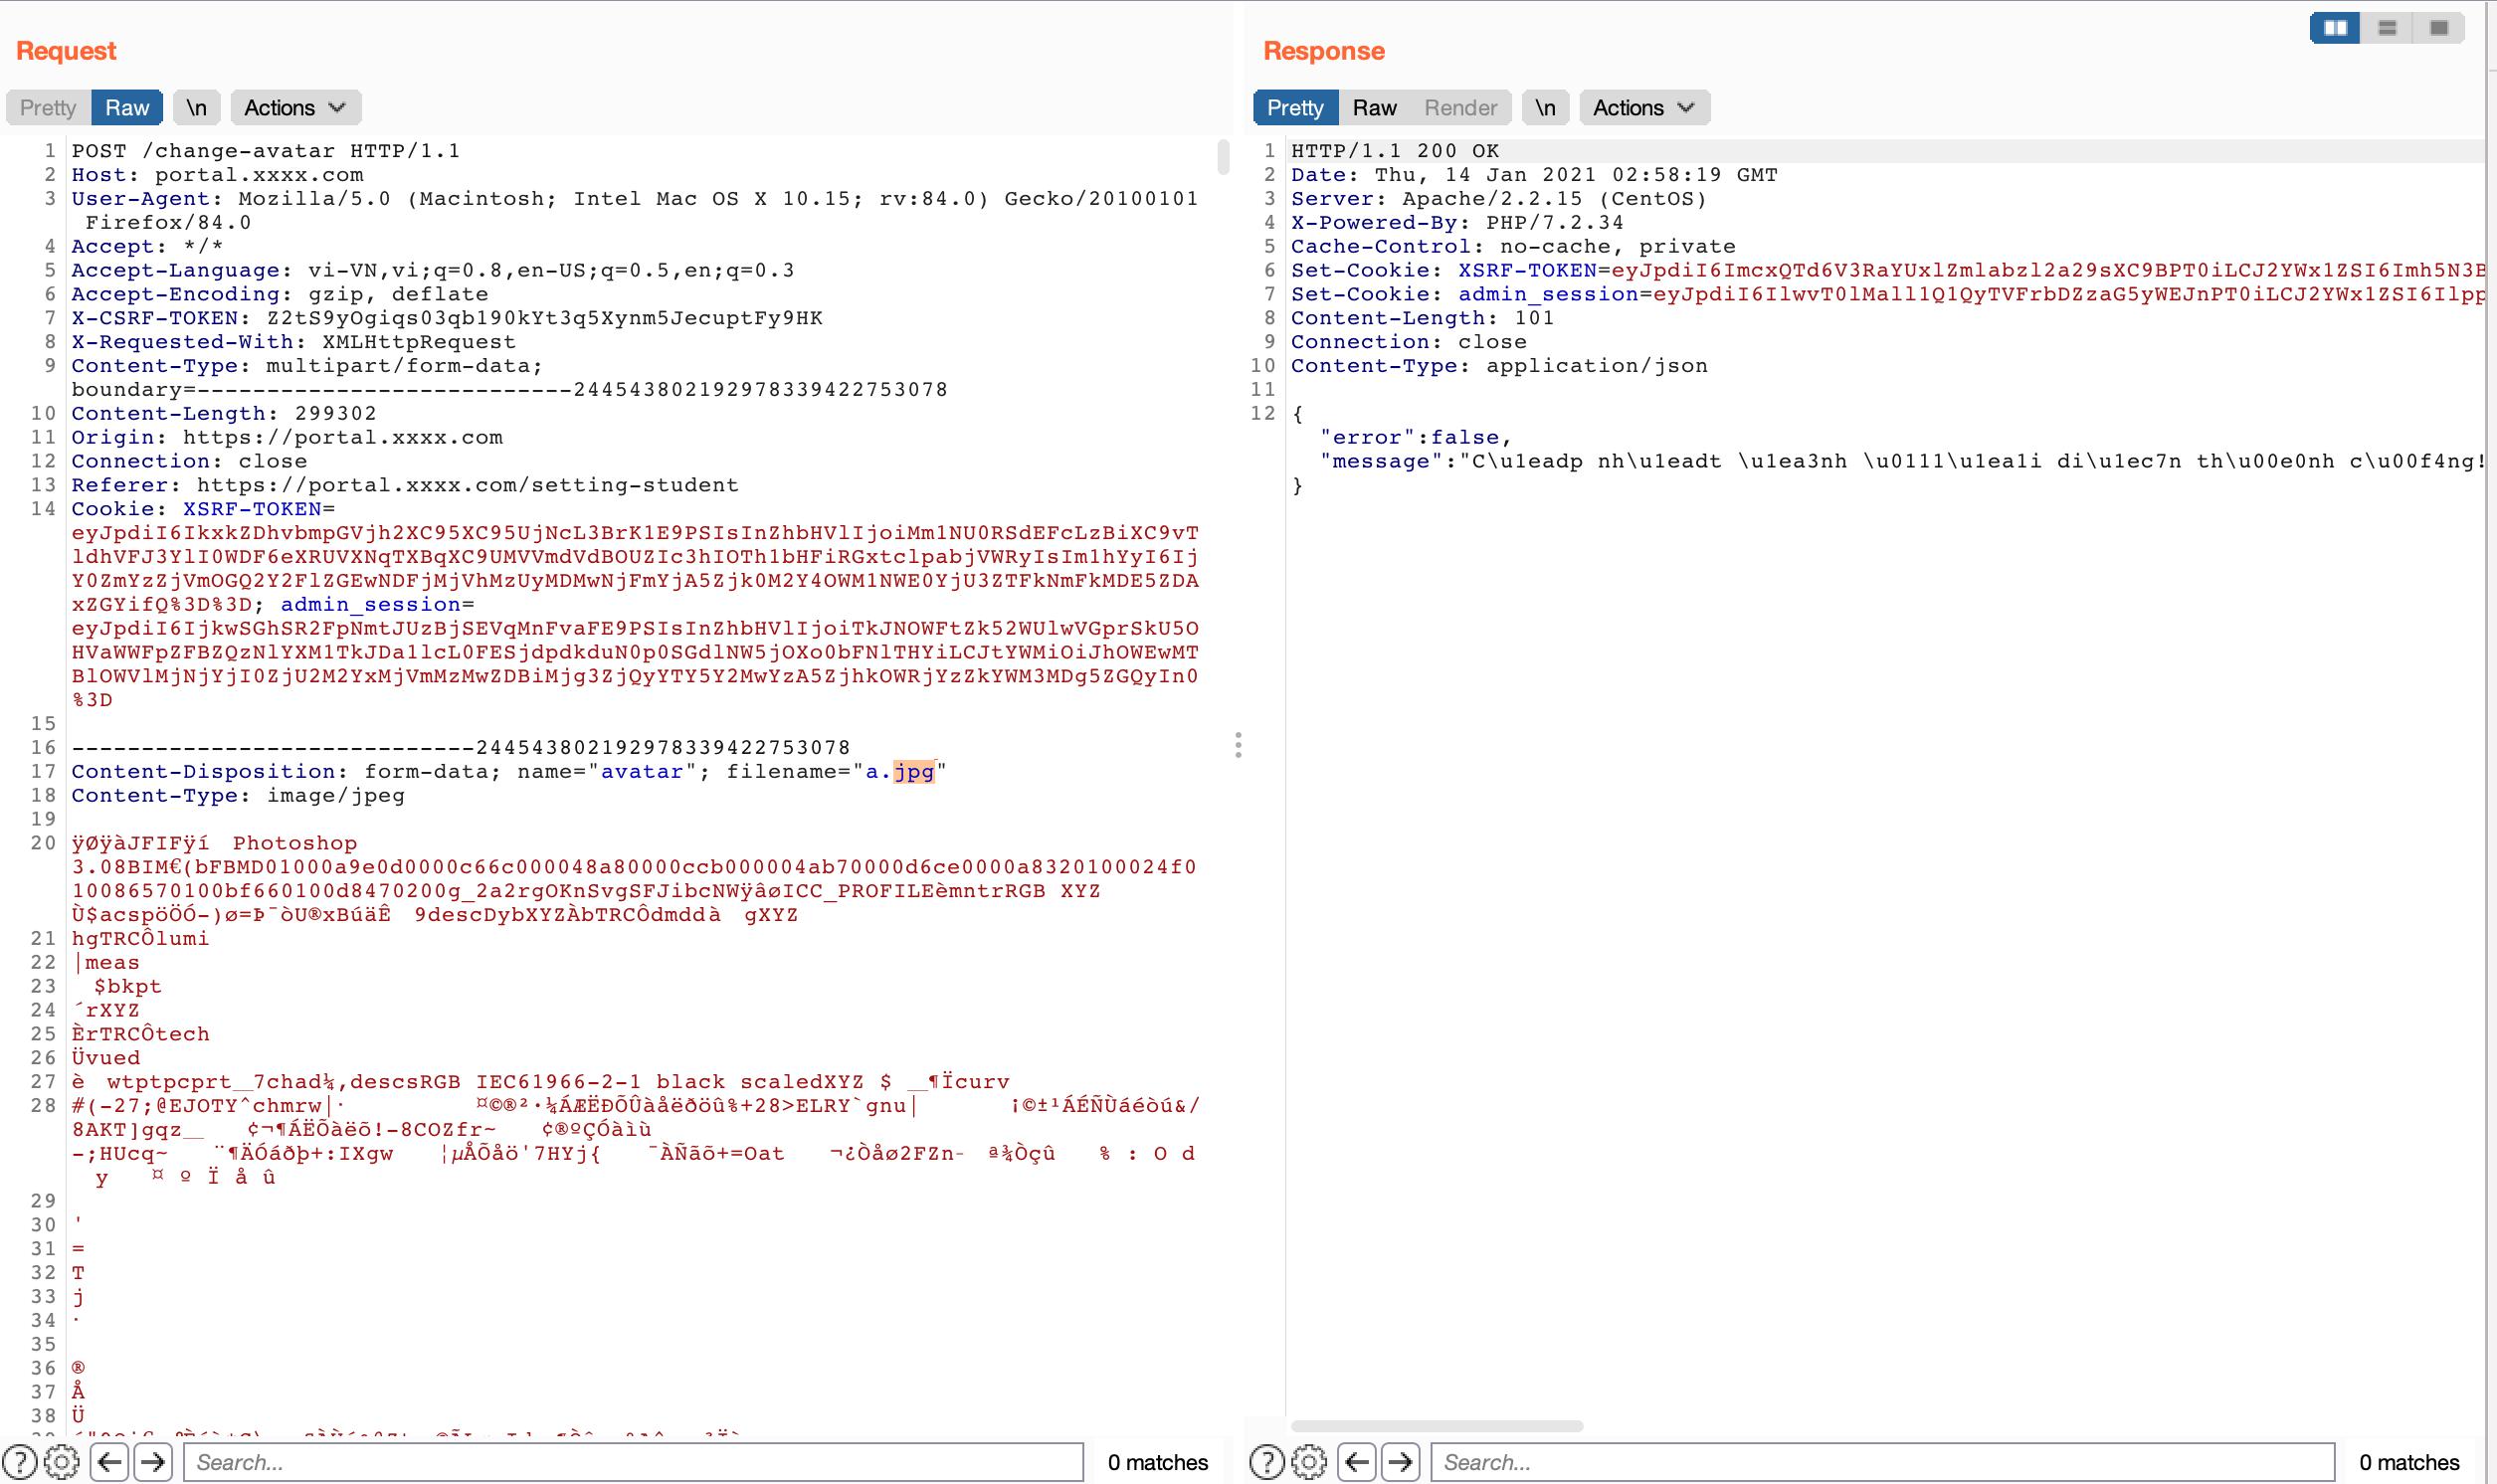 https://manhnv.com/images/posts/hacking/chi-mot-buoi-chieu-toi-da-chiem-quyen-dieu-khien-server-cua-8-website-nhu-the-nao/Screen_Shot_2021-01-14_at_19.30.12.png